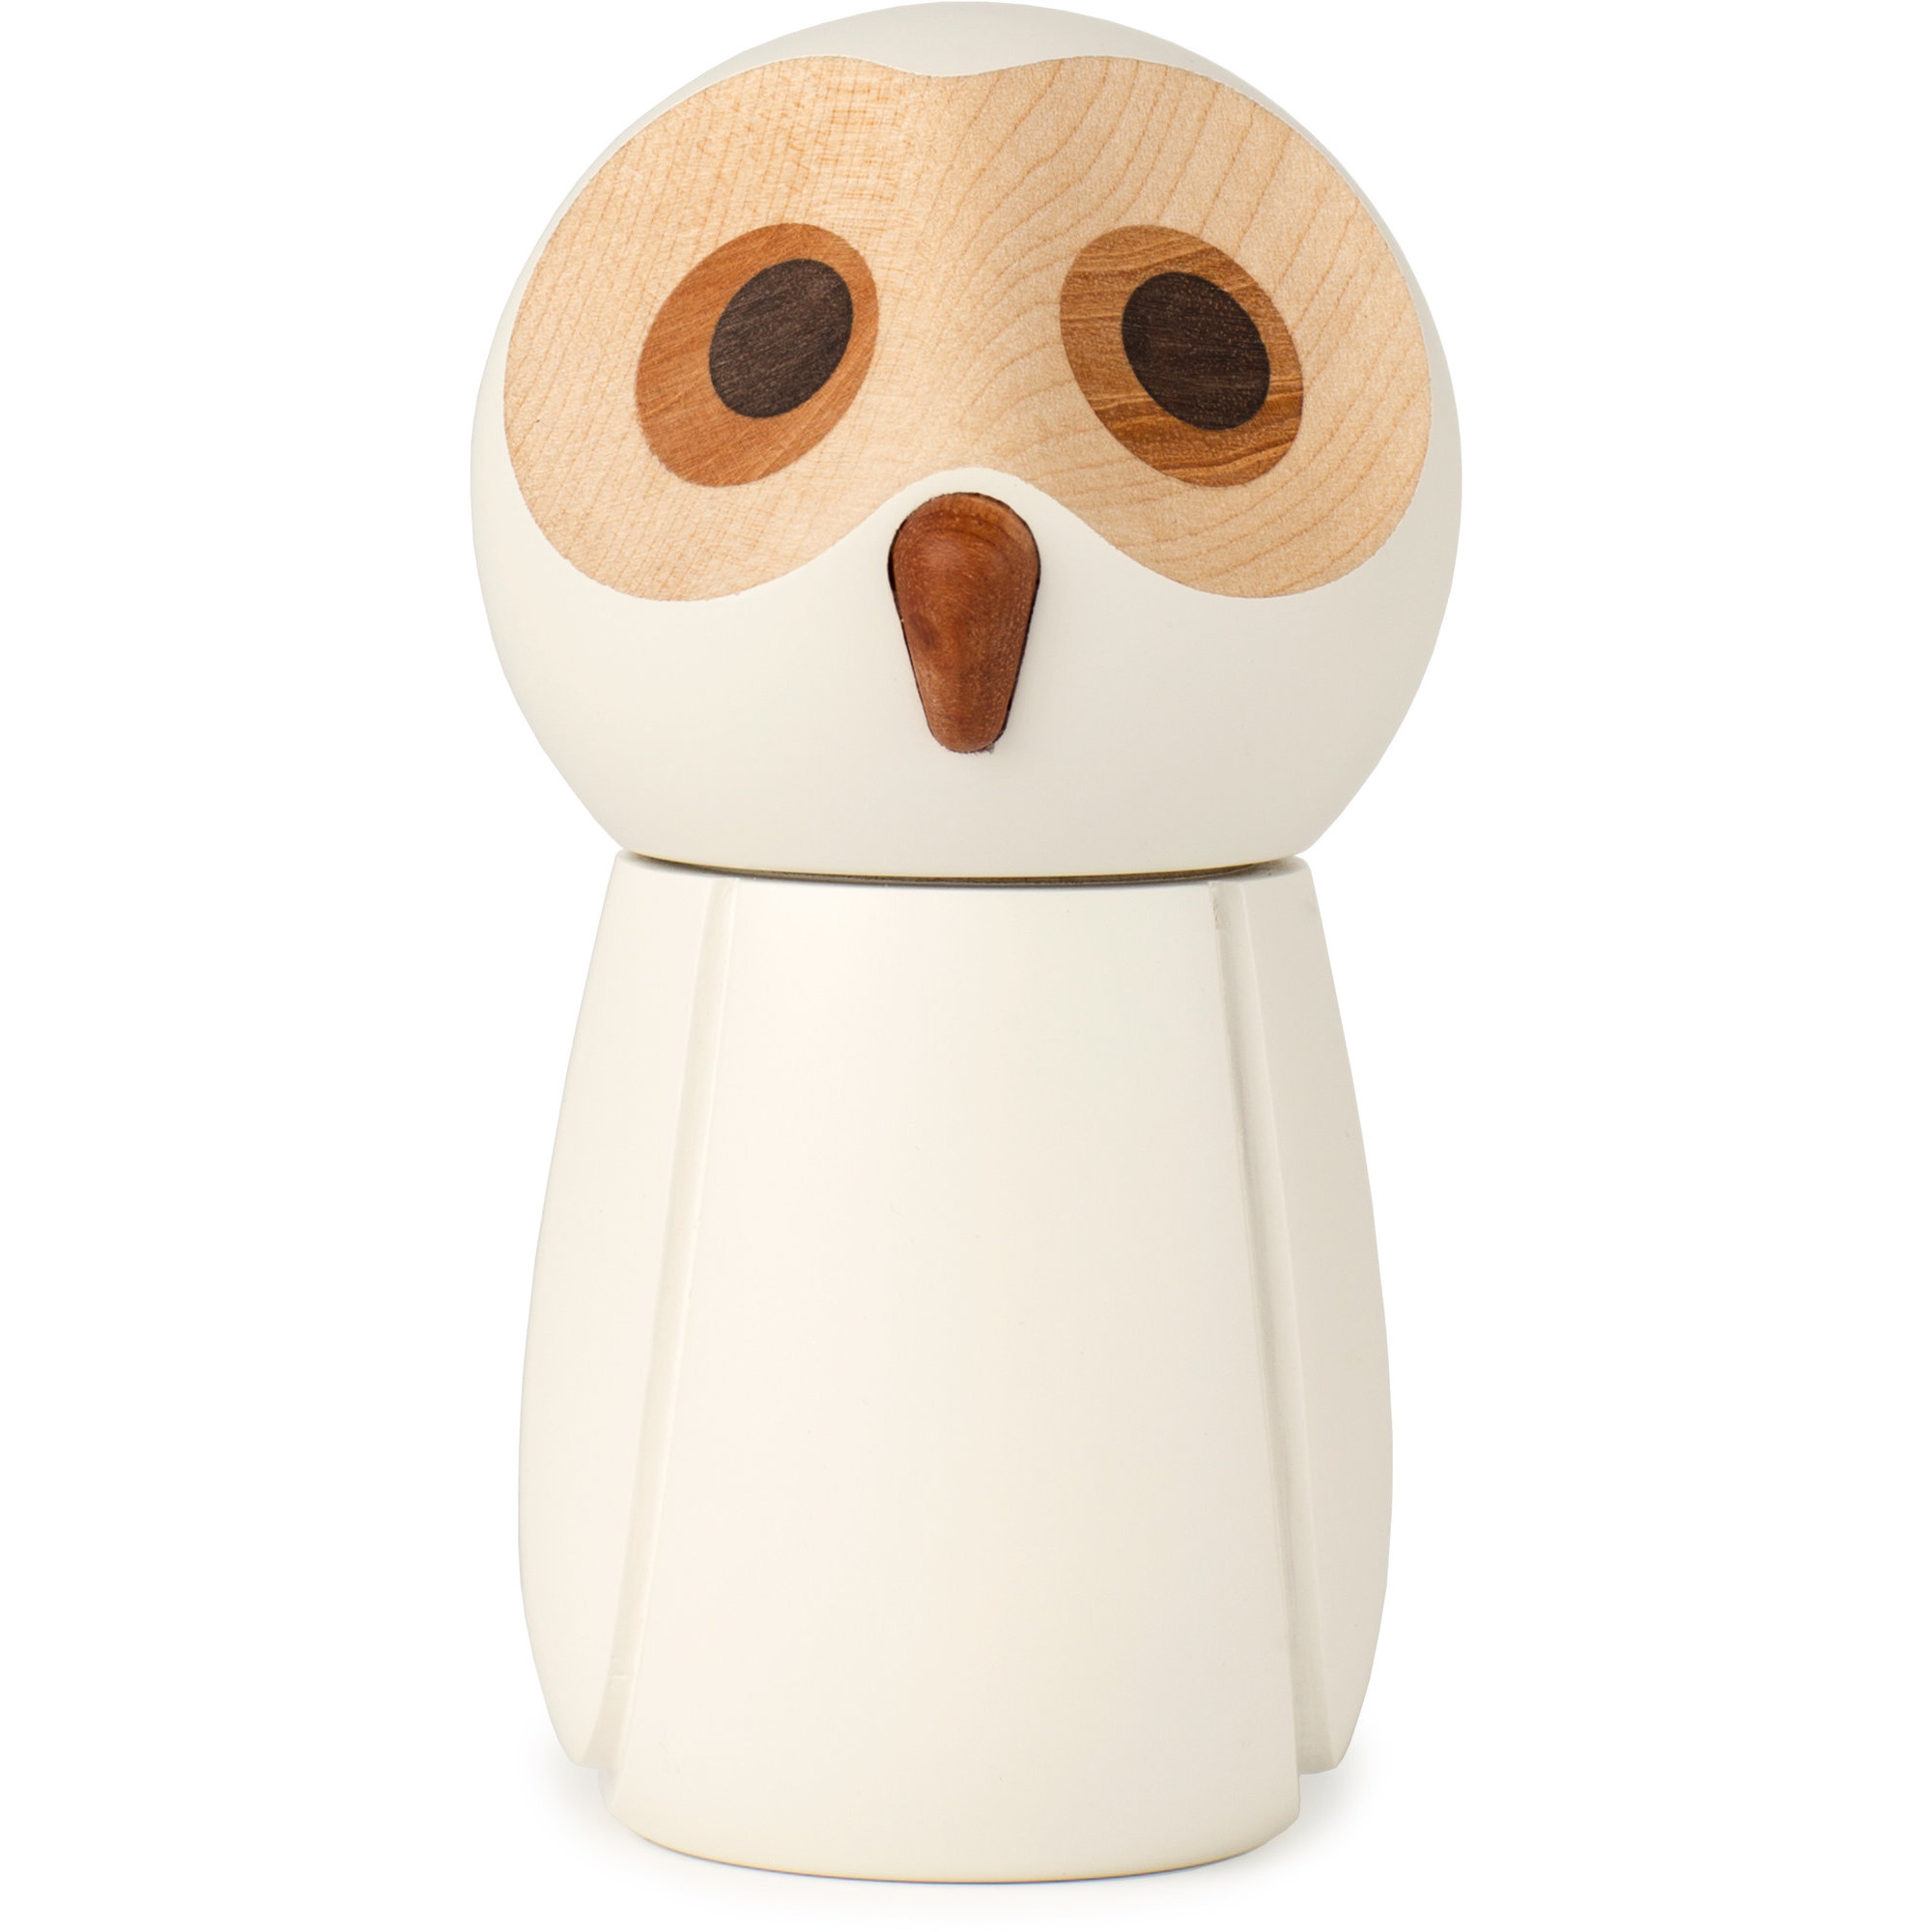 Spring Copenhagen Saltkvarn / The Snowy Owl